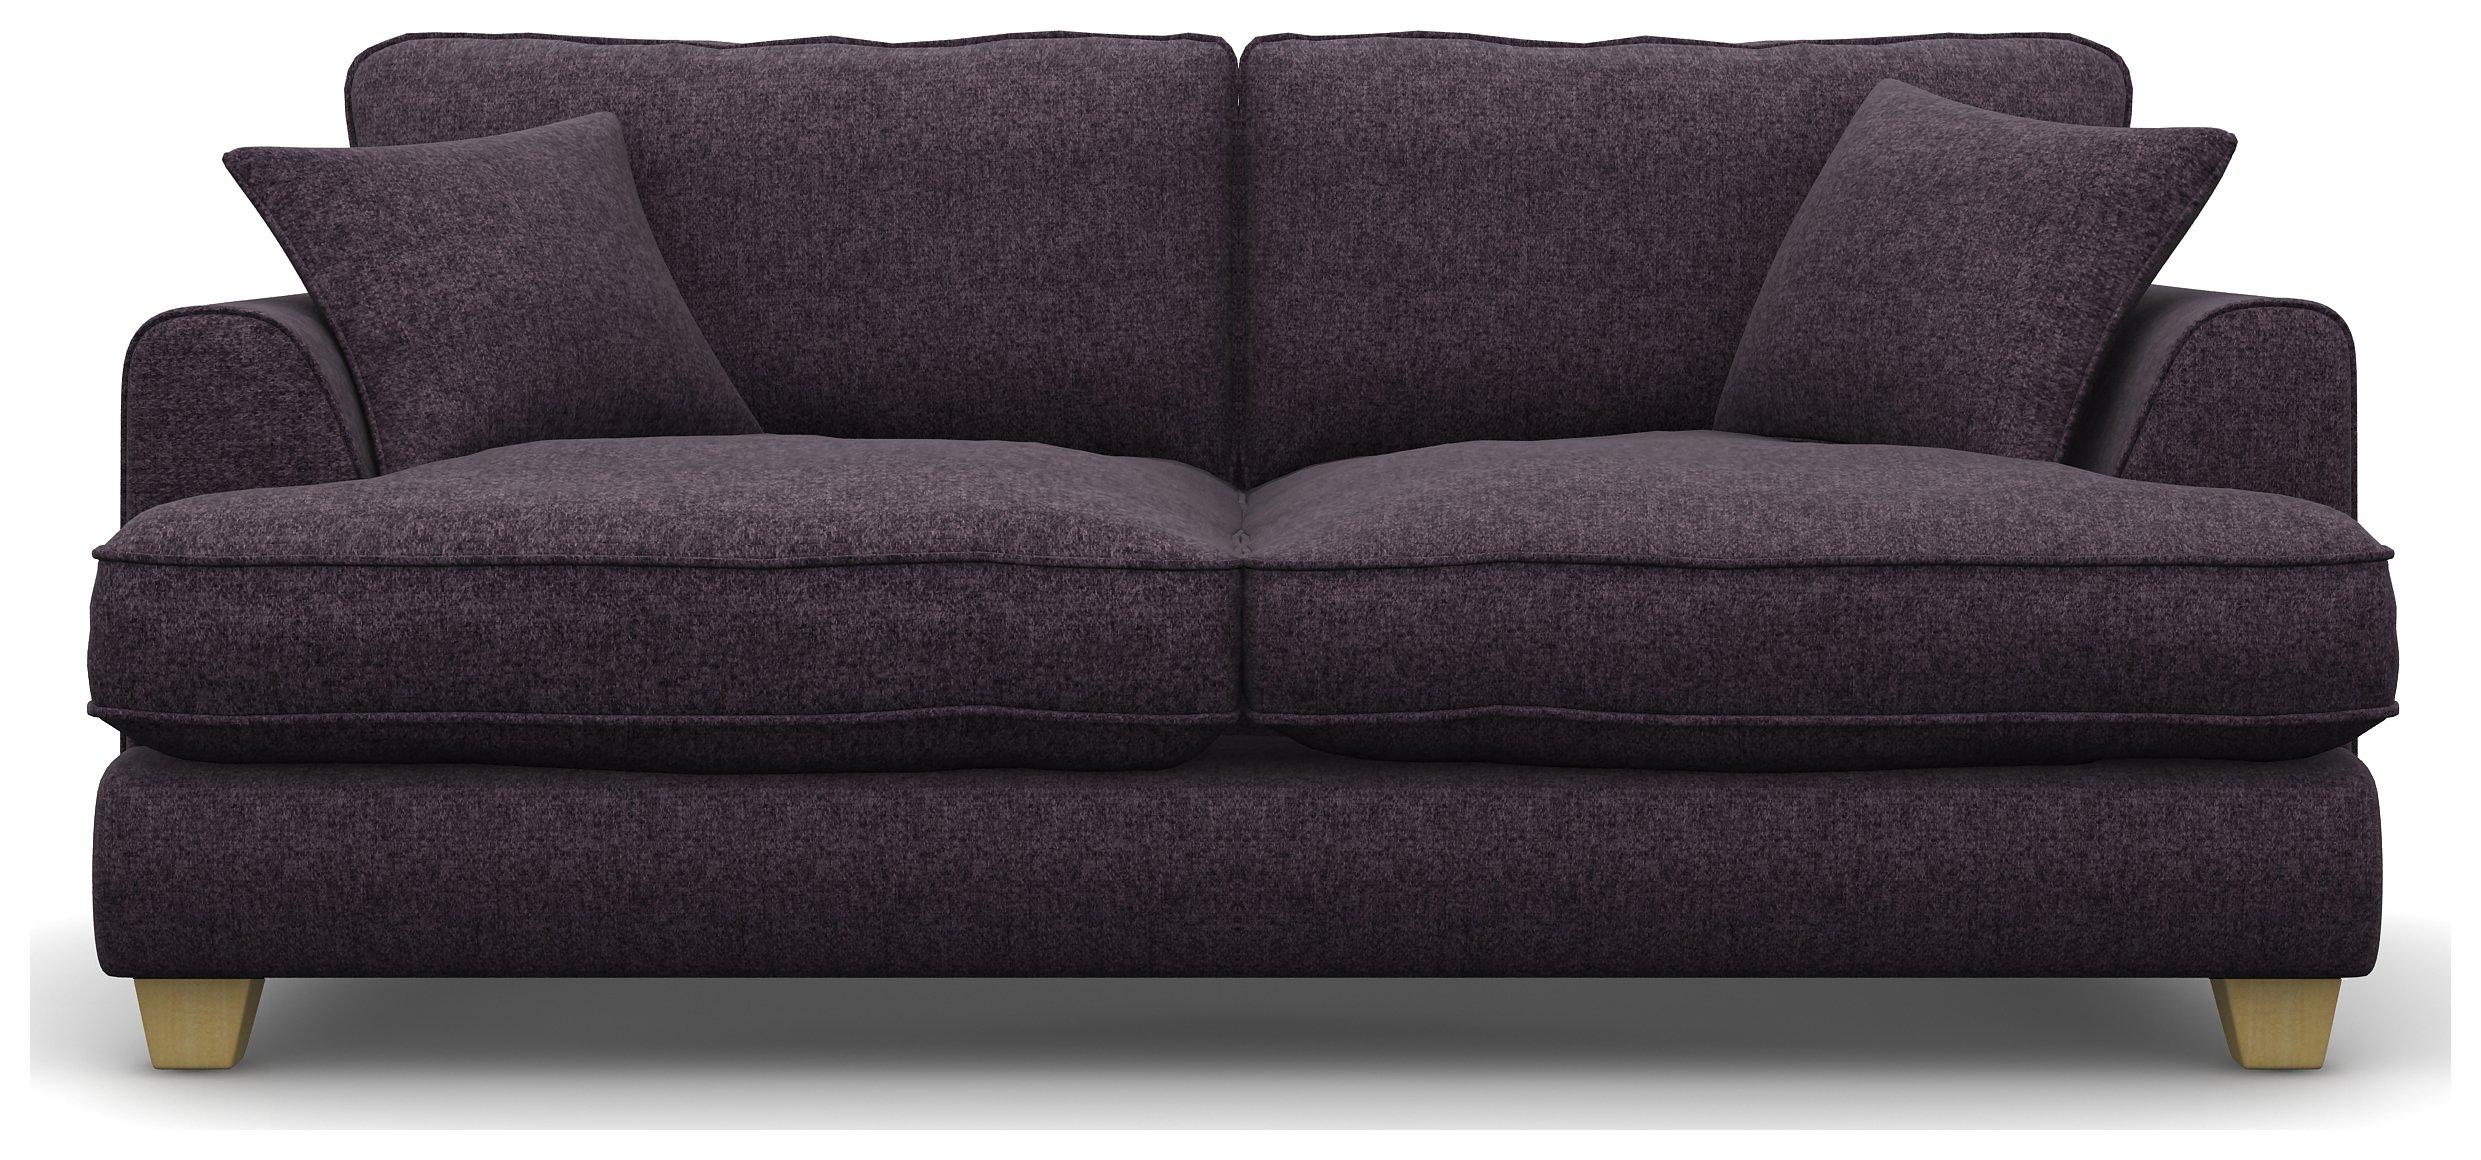 Heart of House Hampstead 3 Seat Tweed Fabric Sofa - Purple.